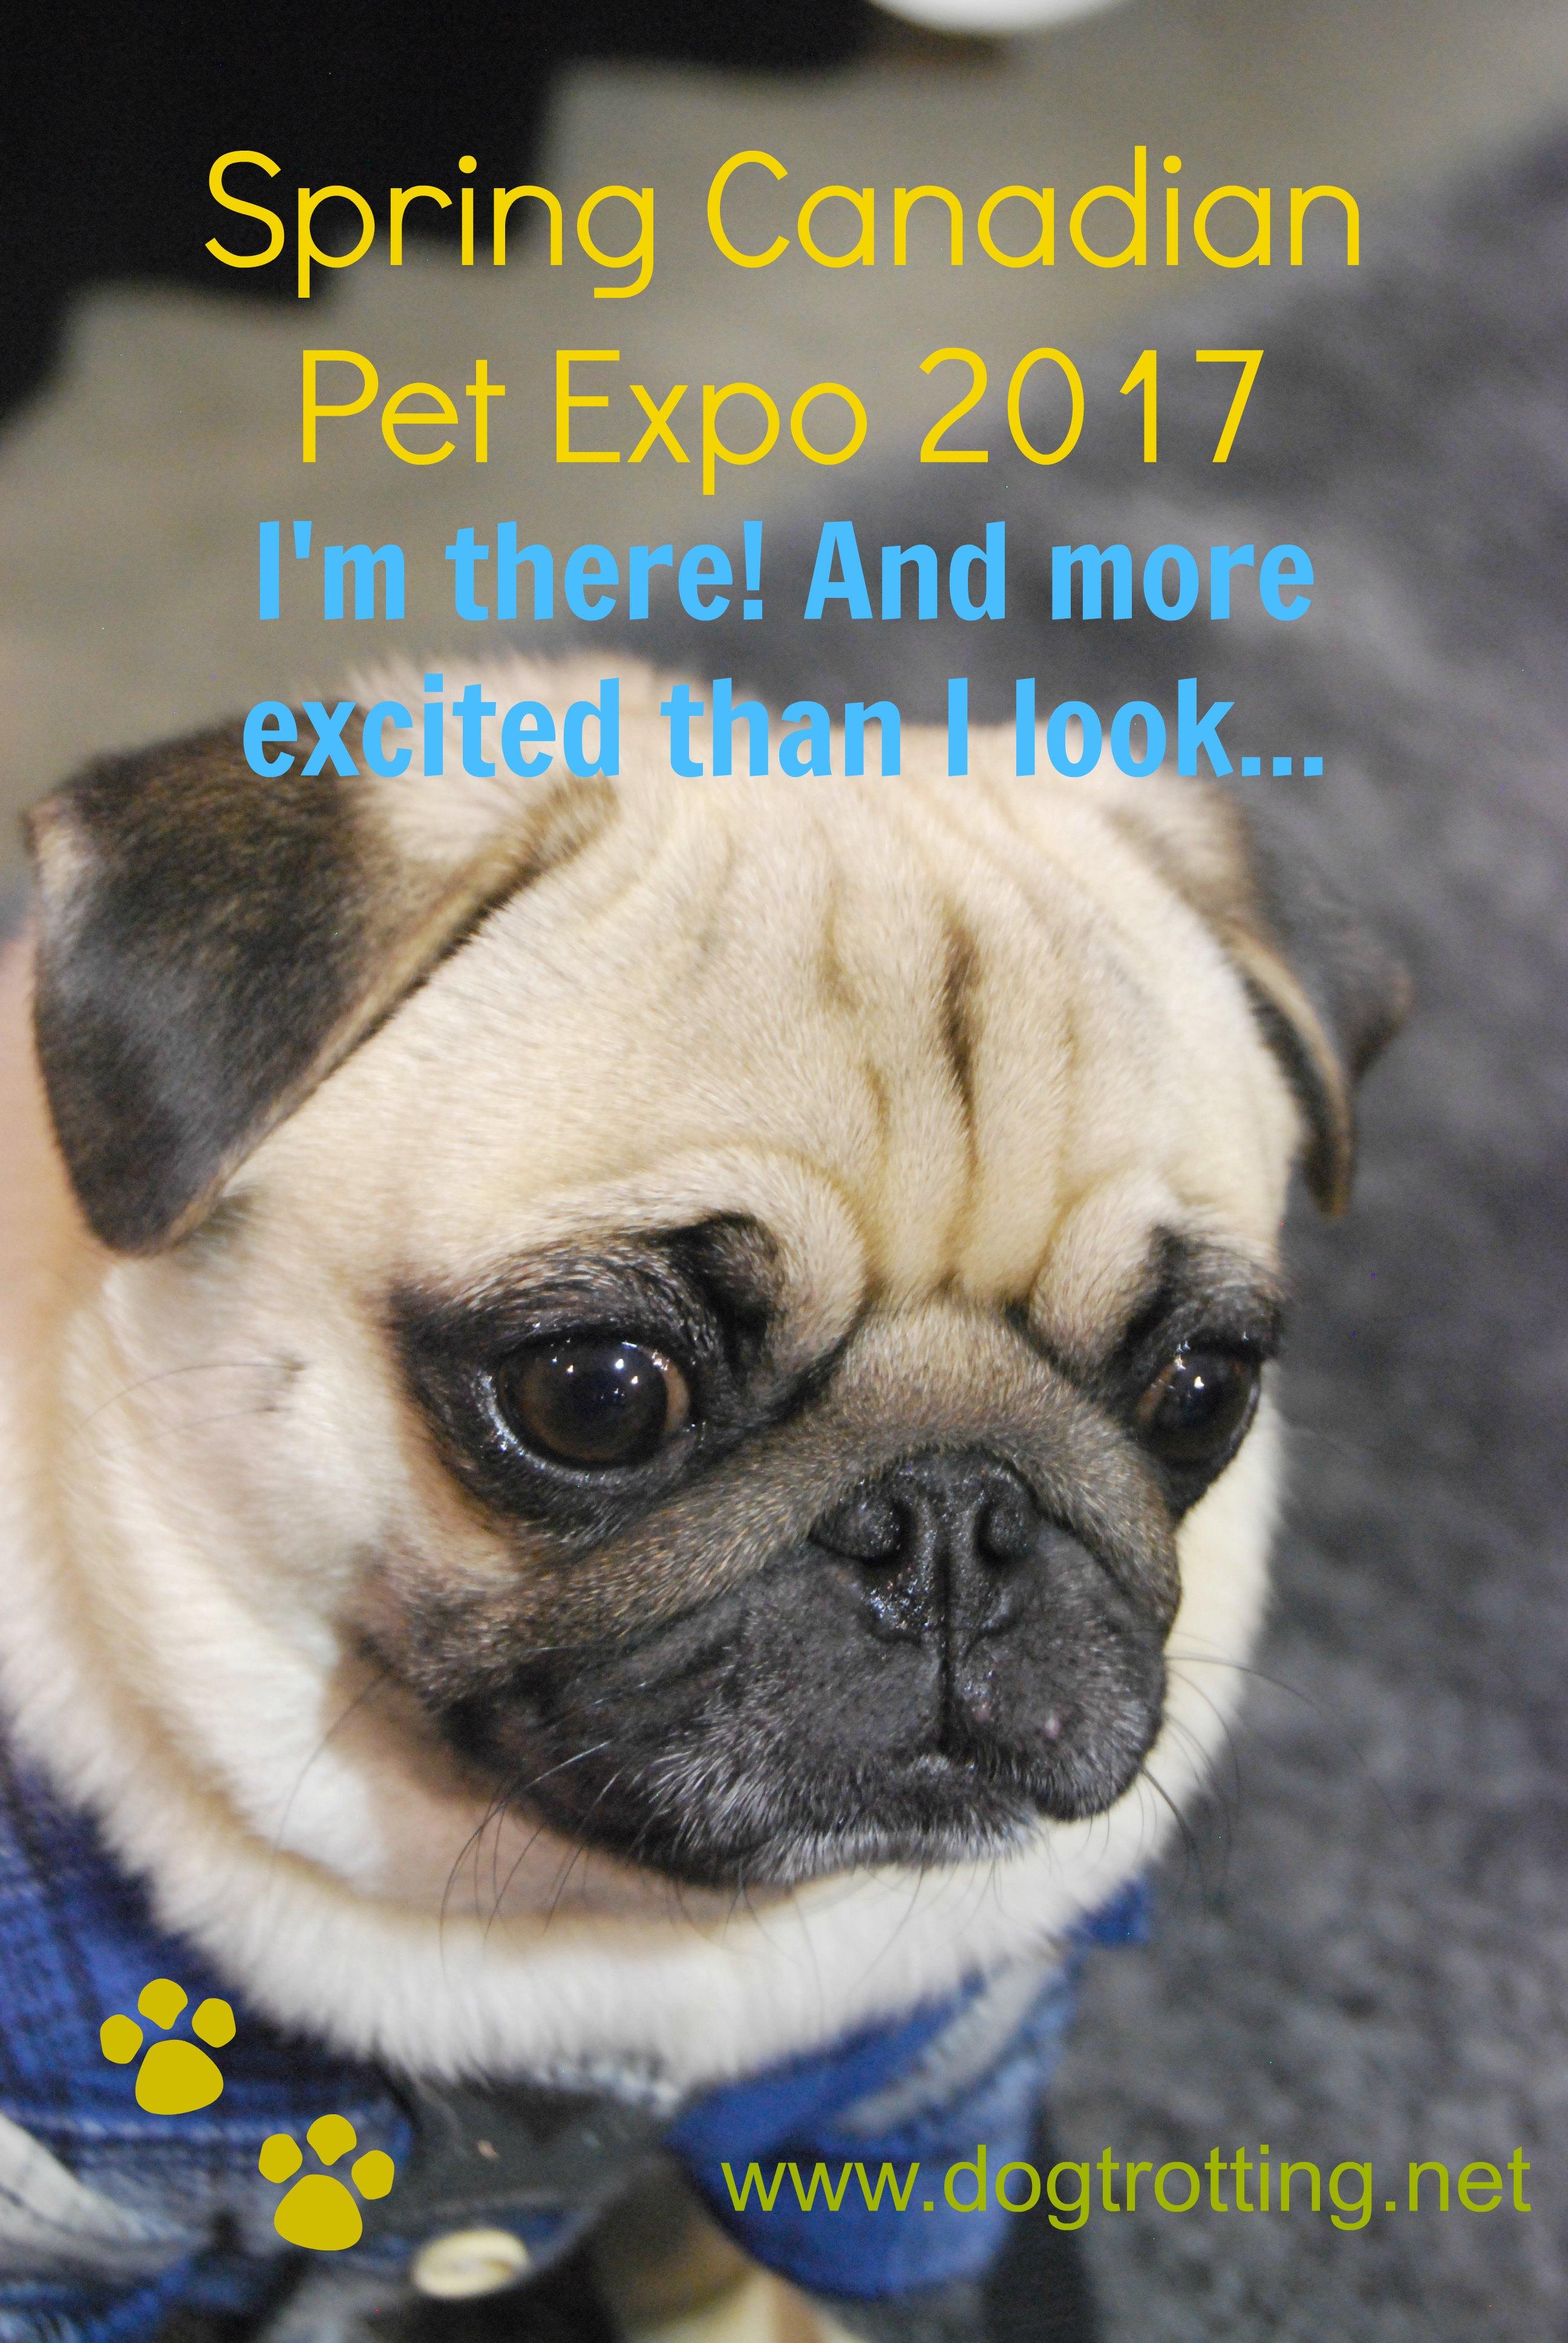 Canadian Pet Expo - pug www.dogtrotting.net